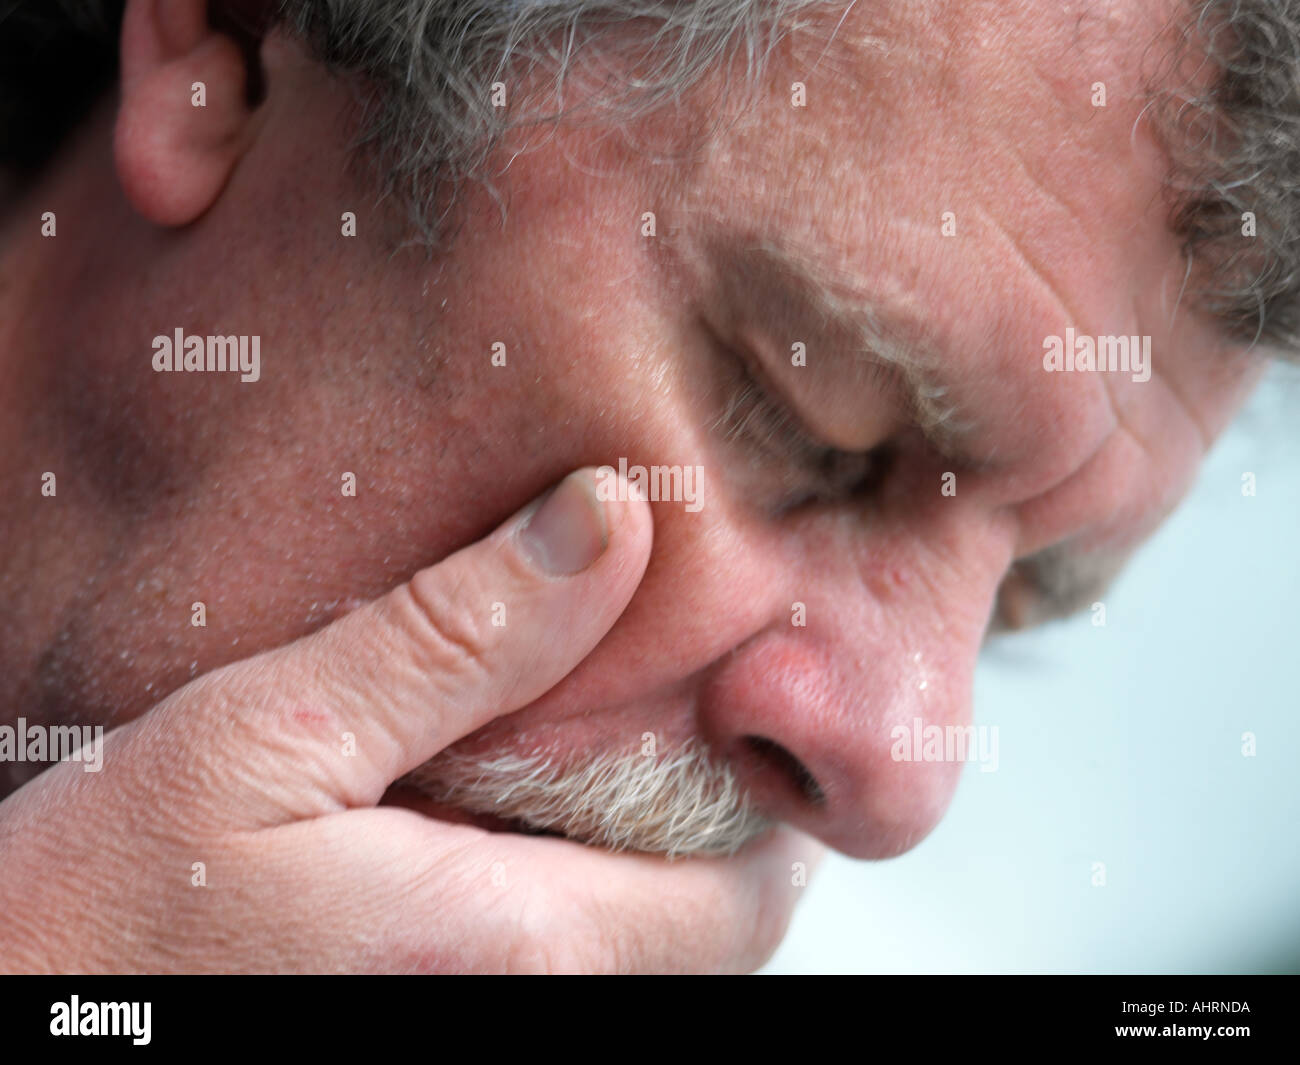 Man Choking Hand Across Face - Stock Image